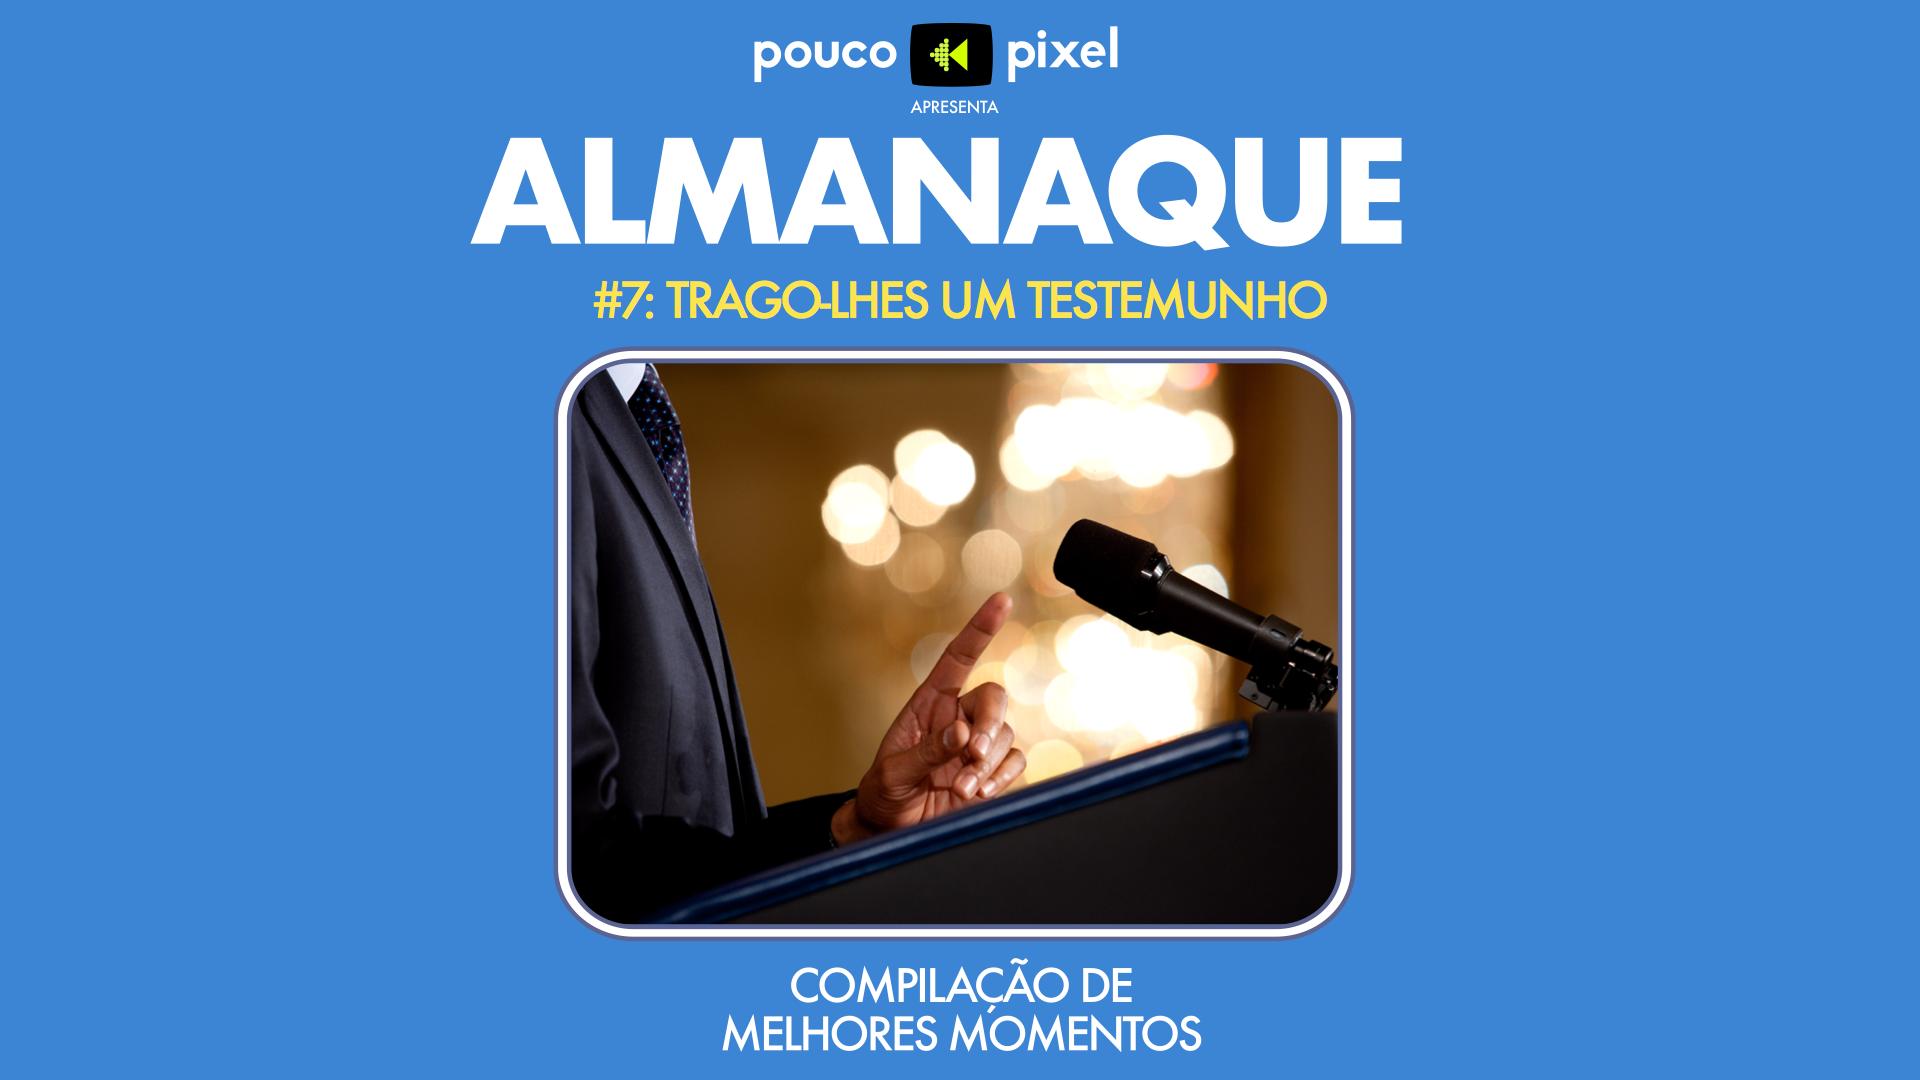 Capa - Almanaque 7 - Trago-lhes um testemunho